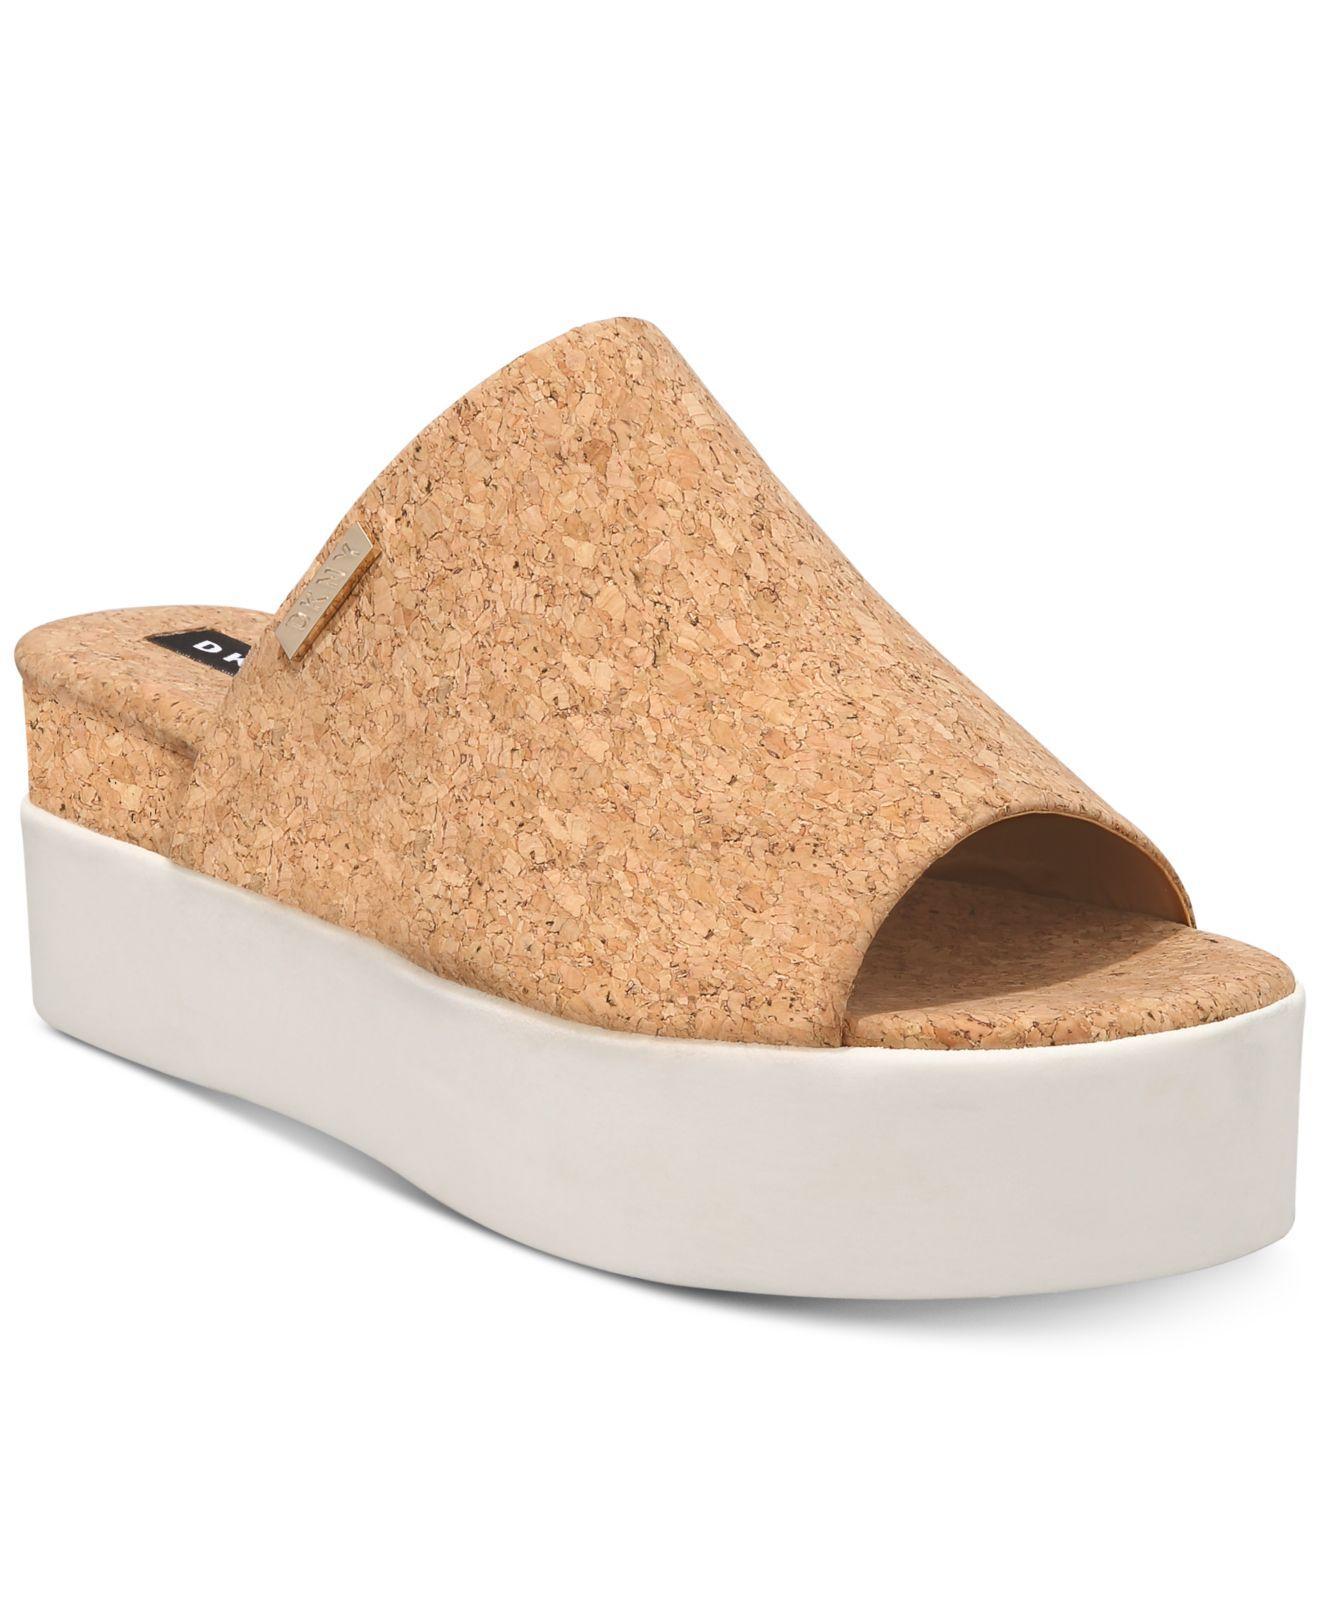 0553b22bd98 DKNY. Women s Natural Carli Sandals ...